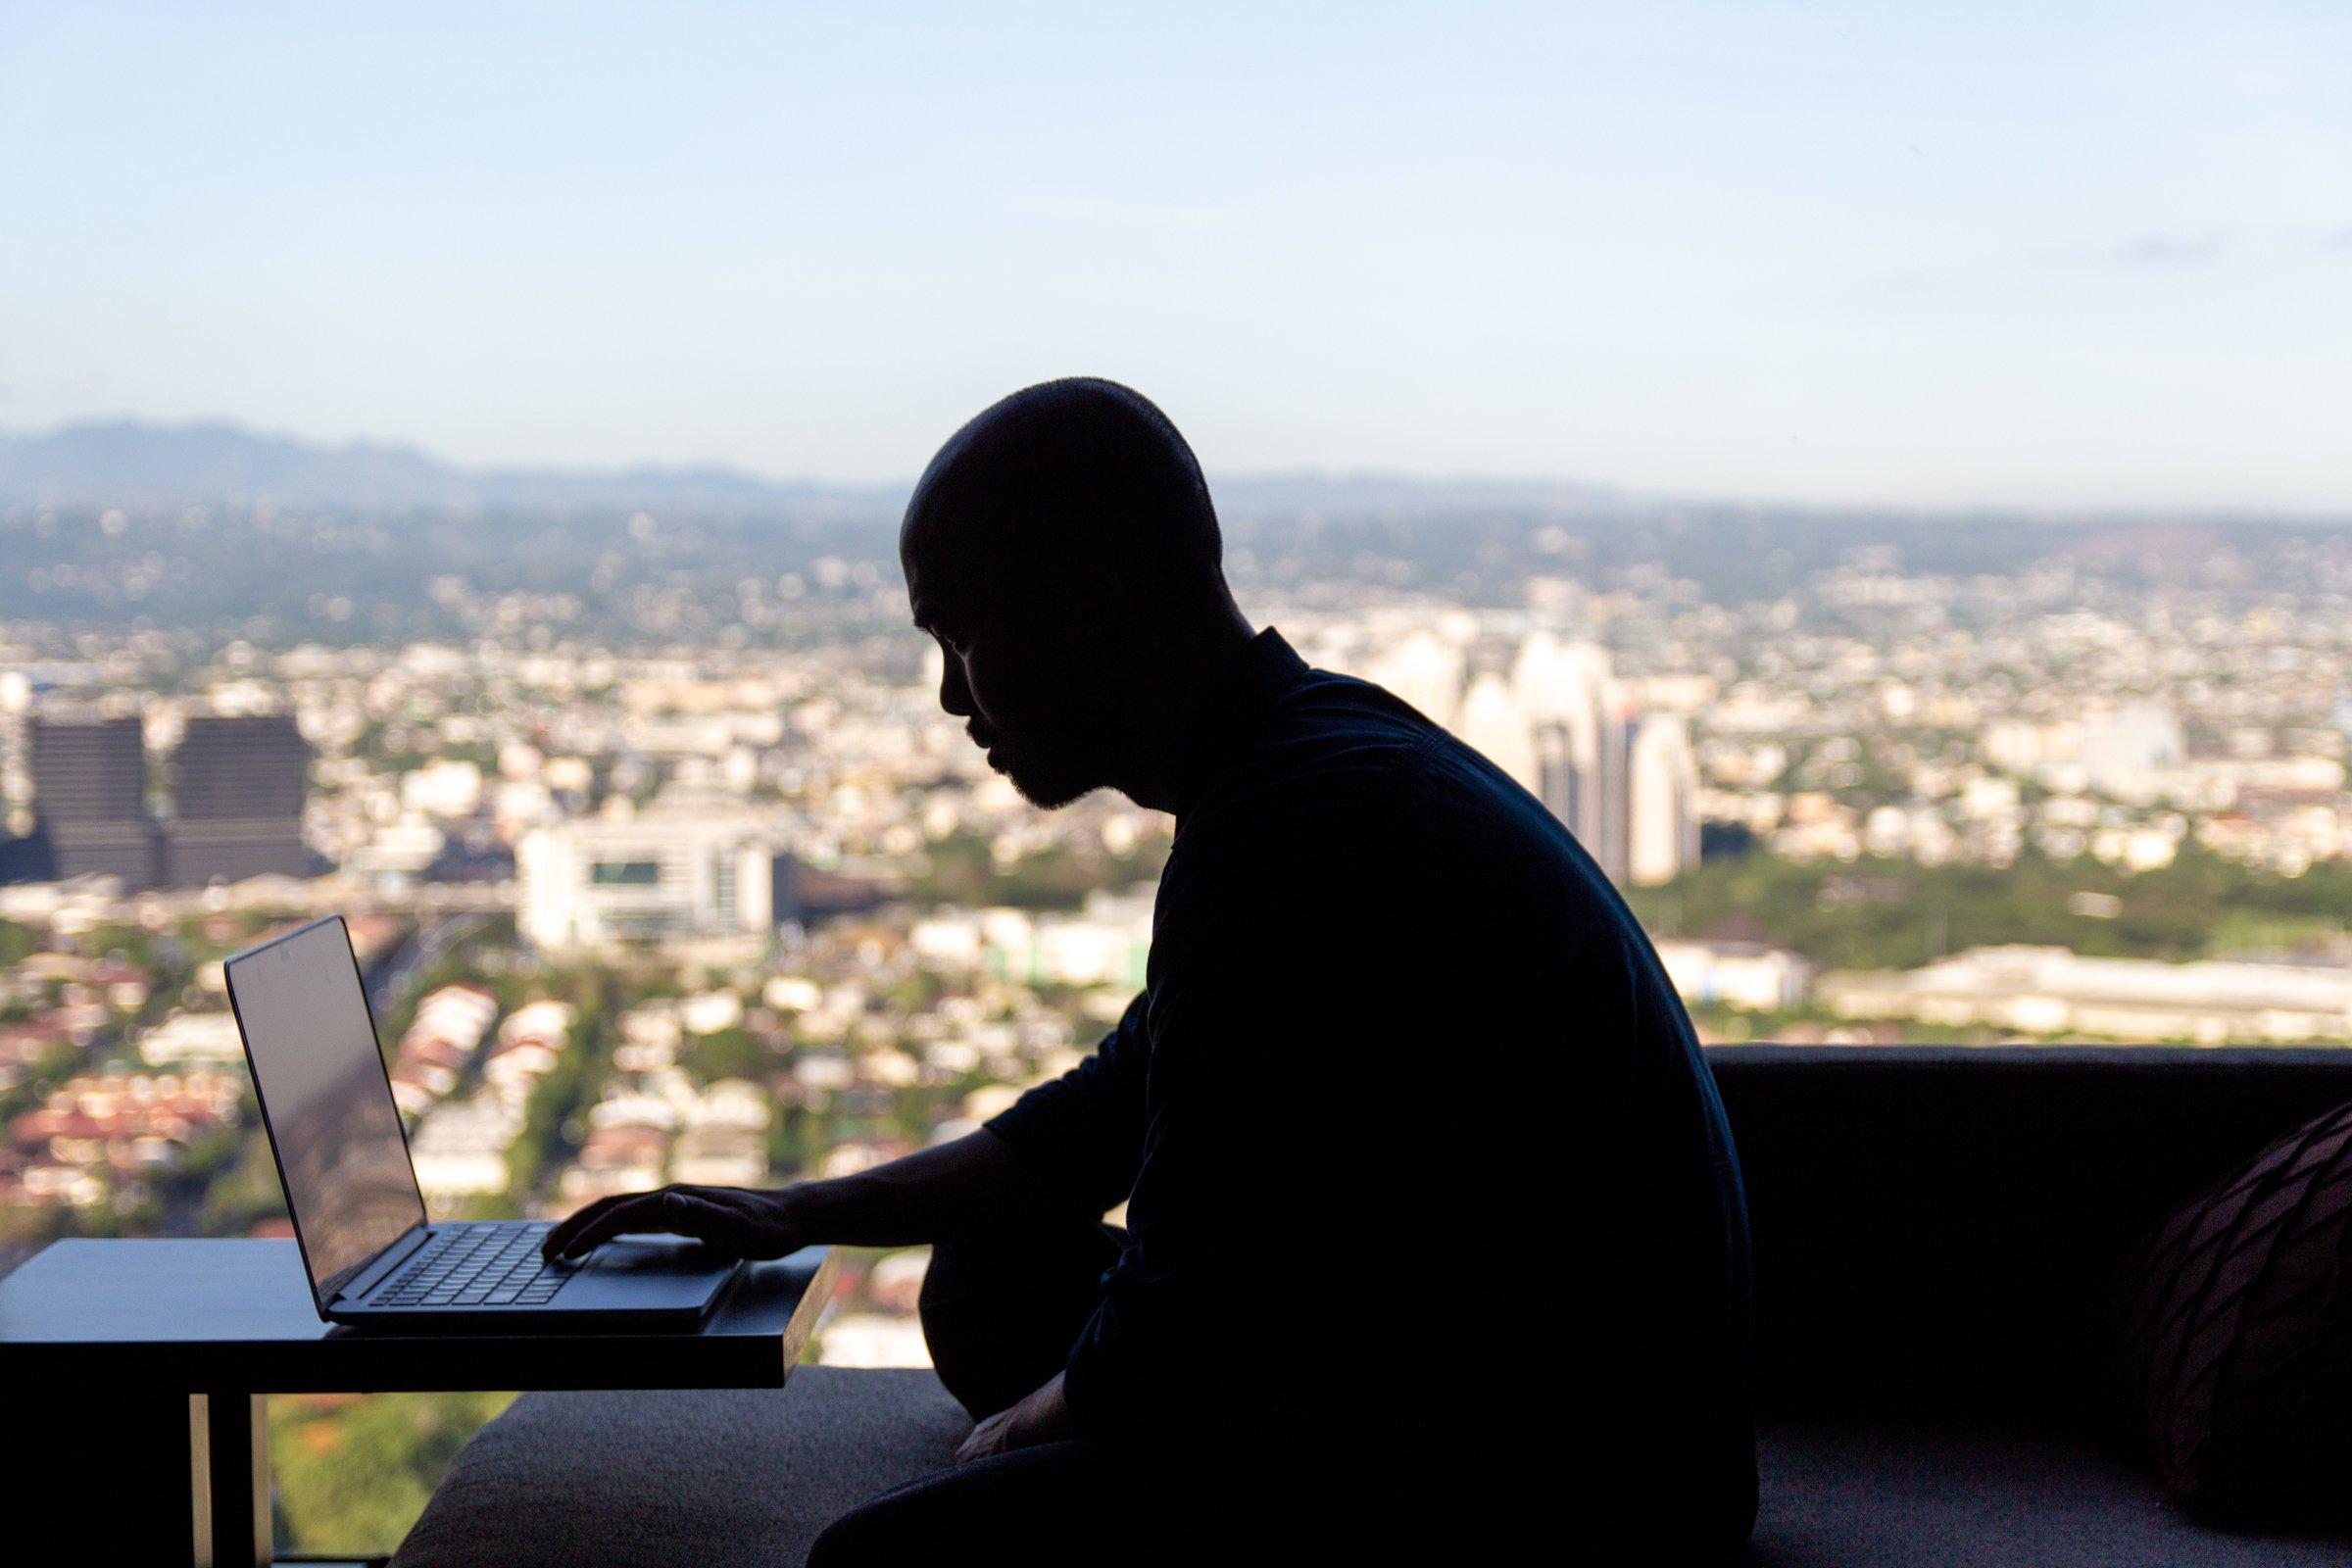 Man On Laptop Near Window